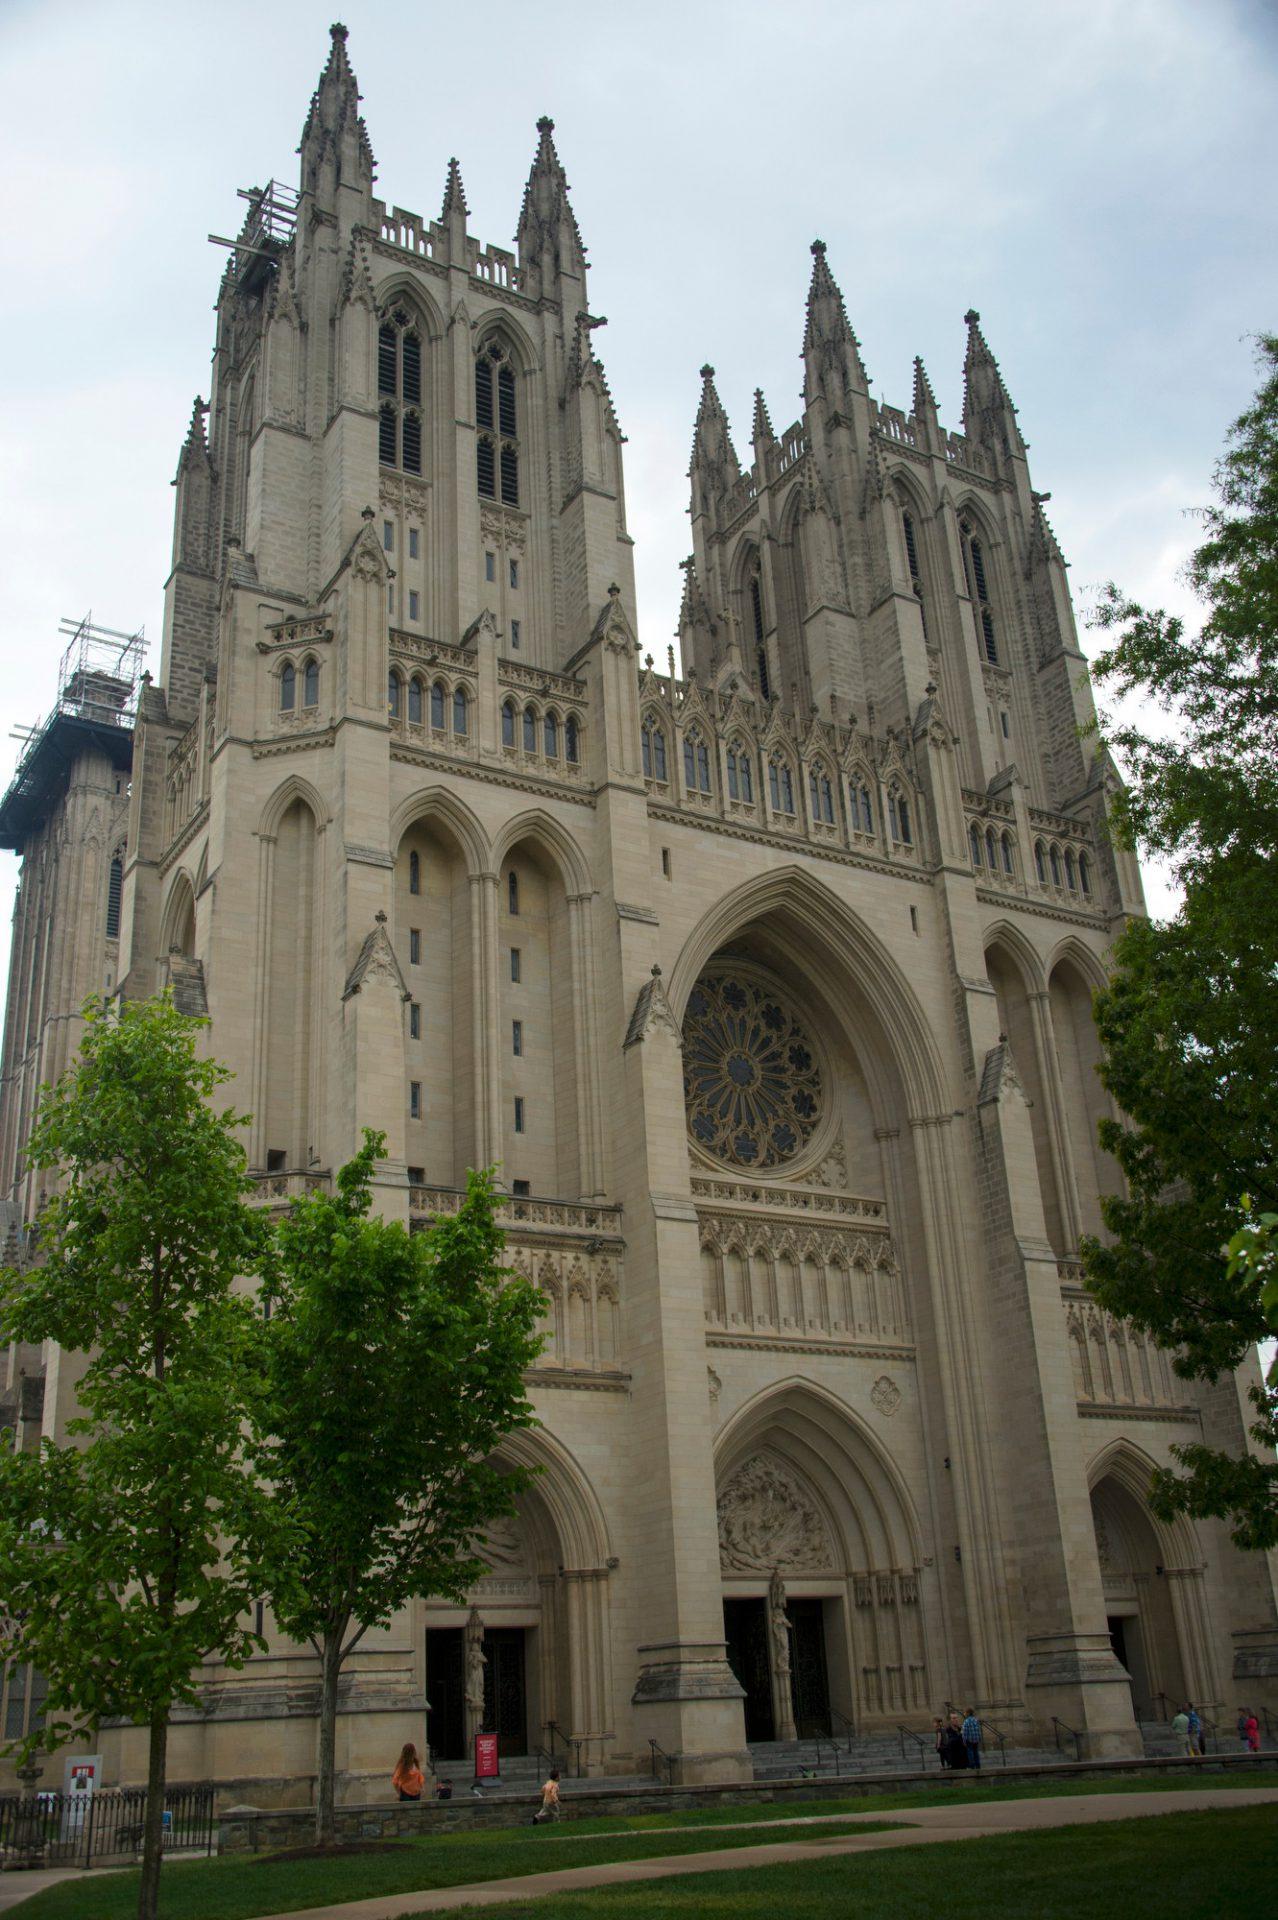 Photo: The Washington National Cathedral in Washington, D.C.